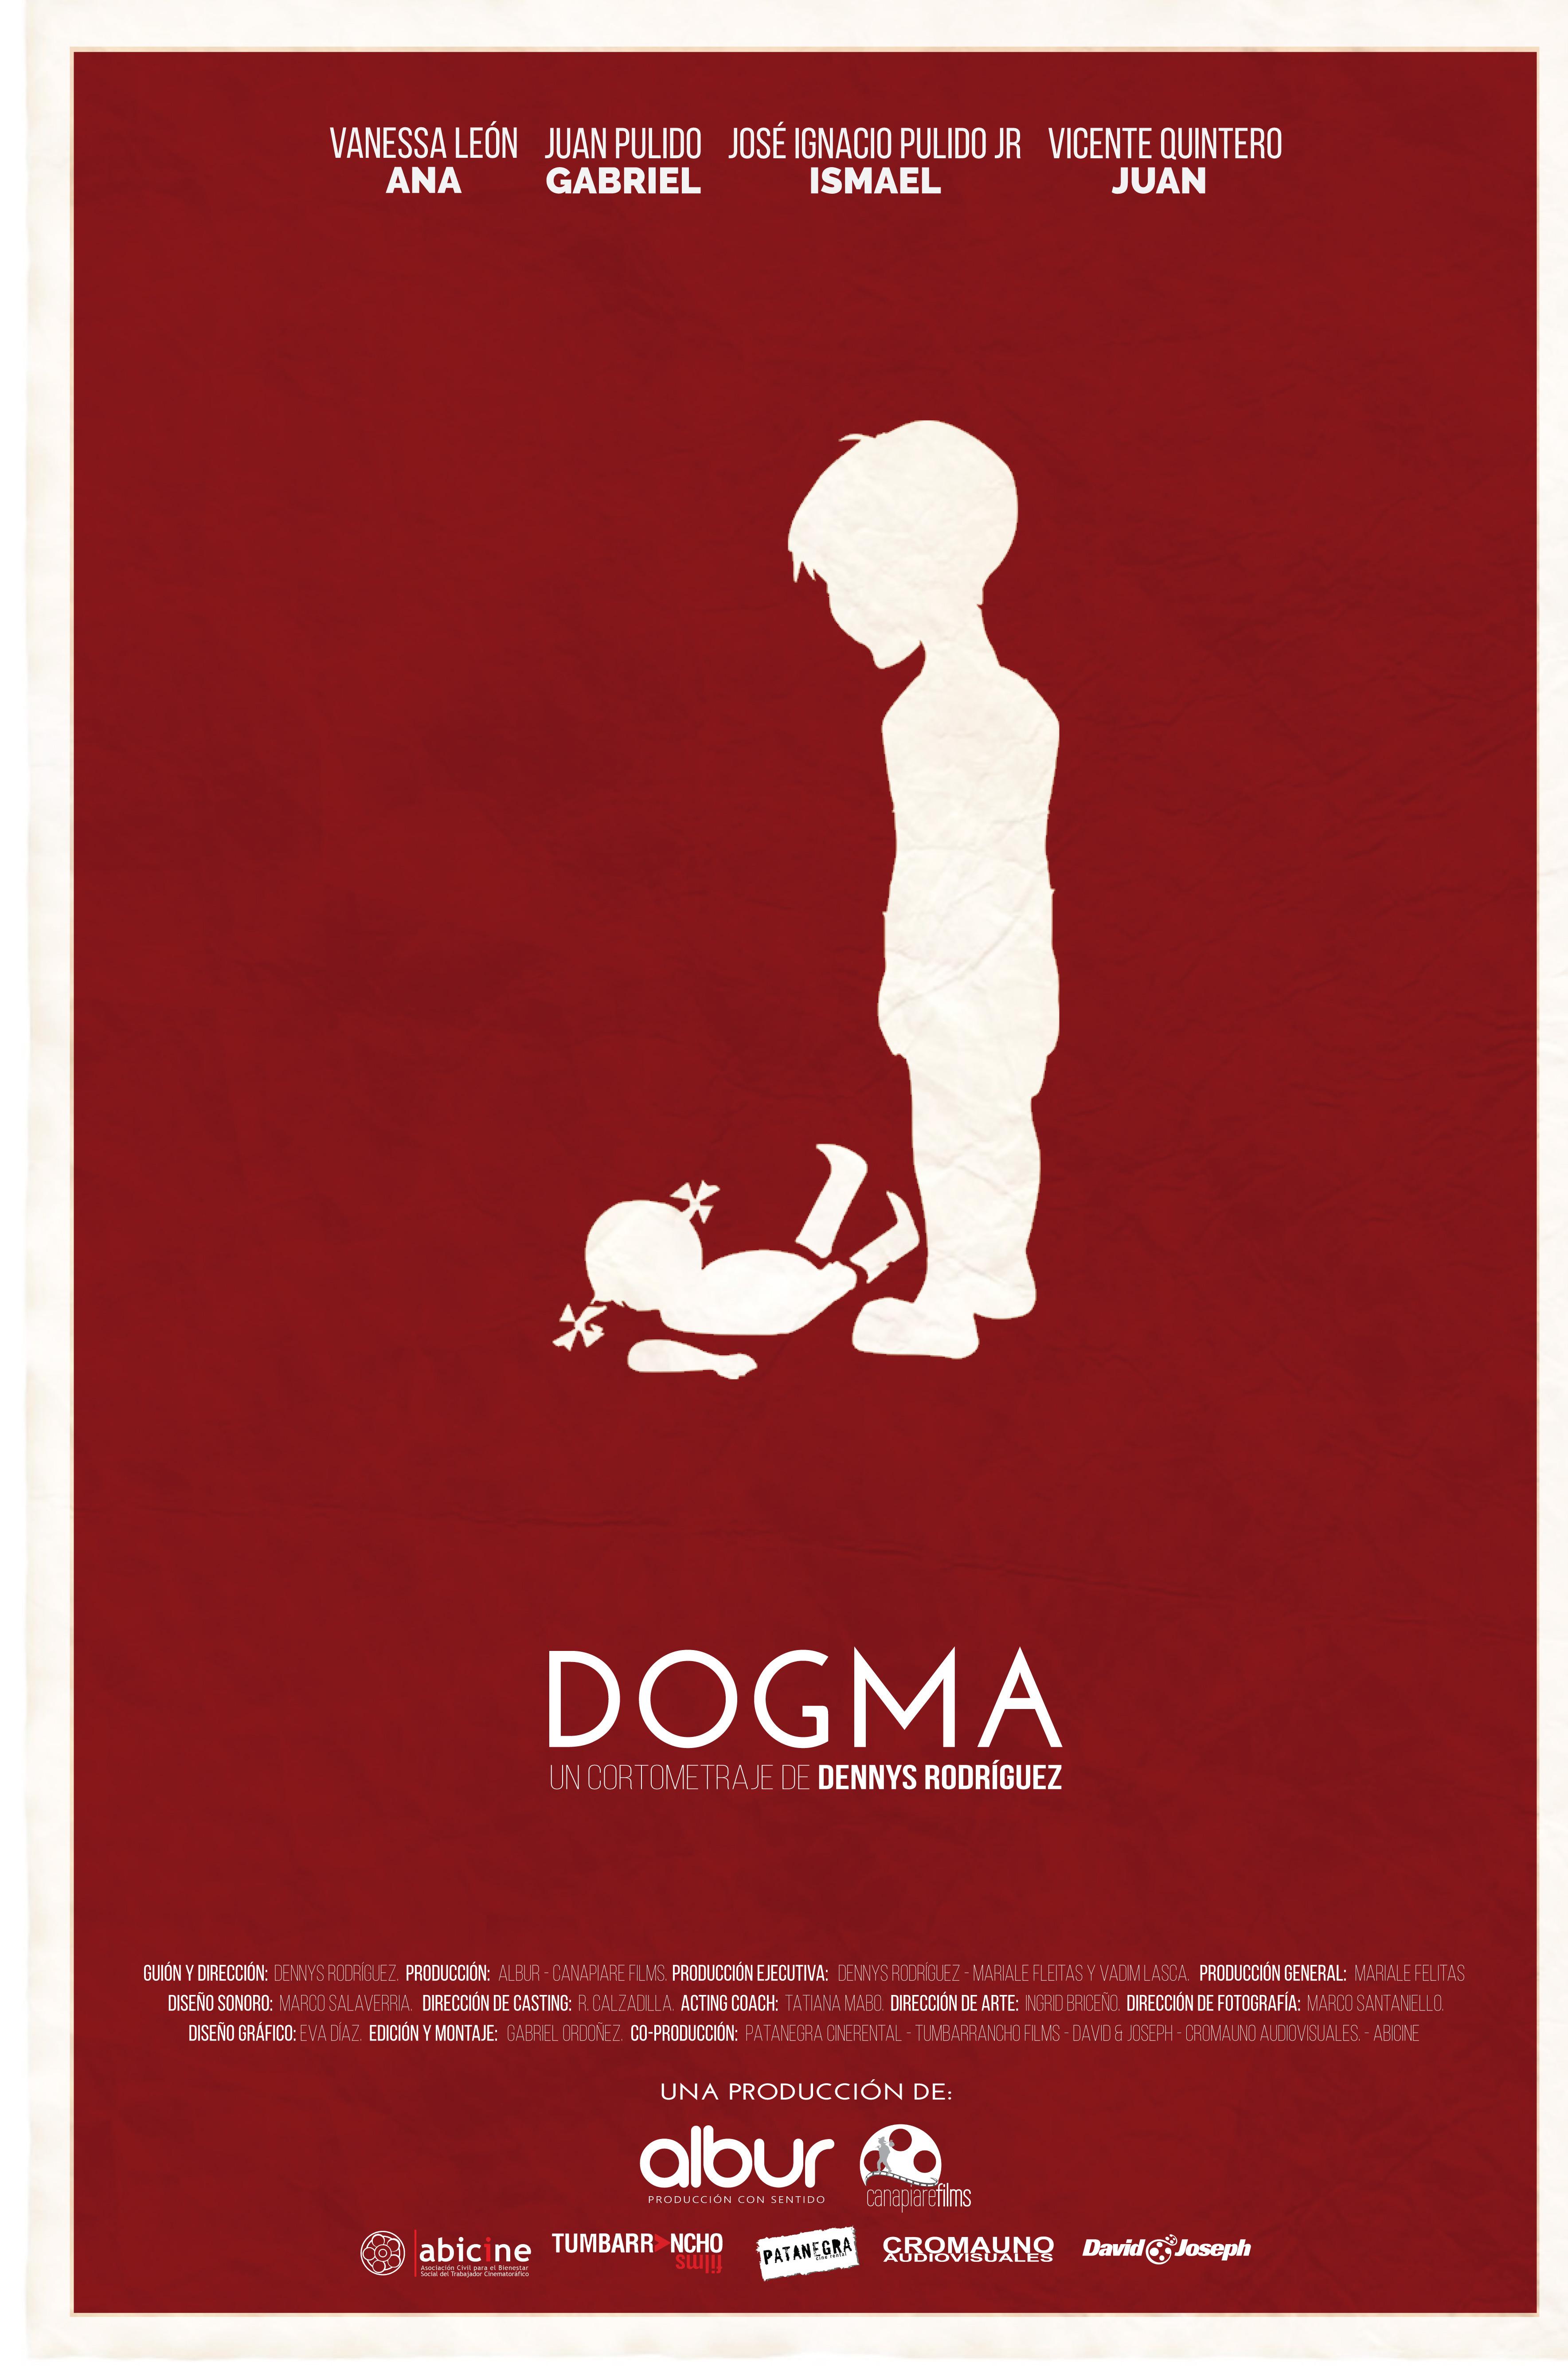 dogma full movie free download